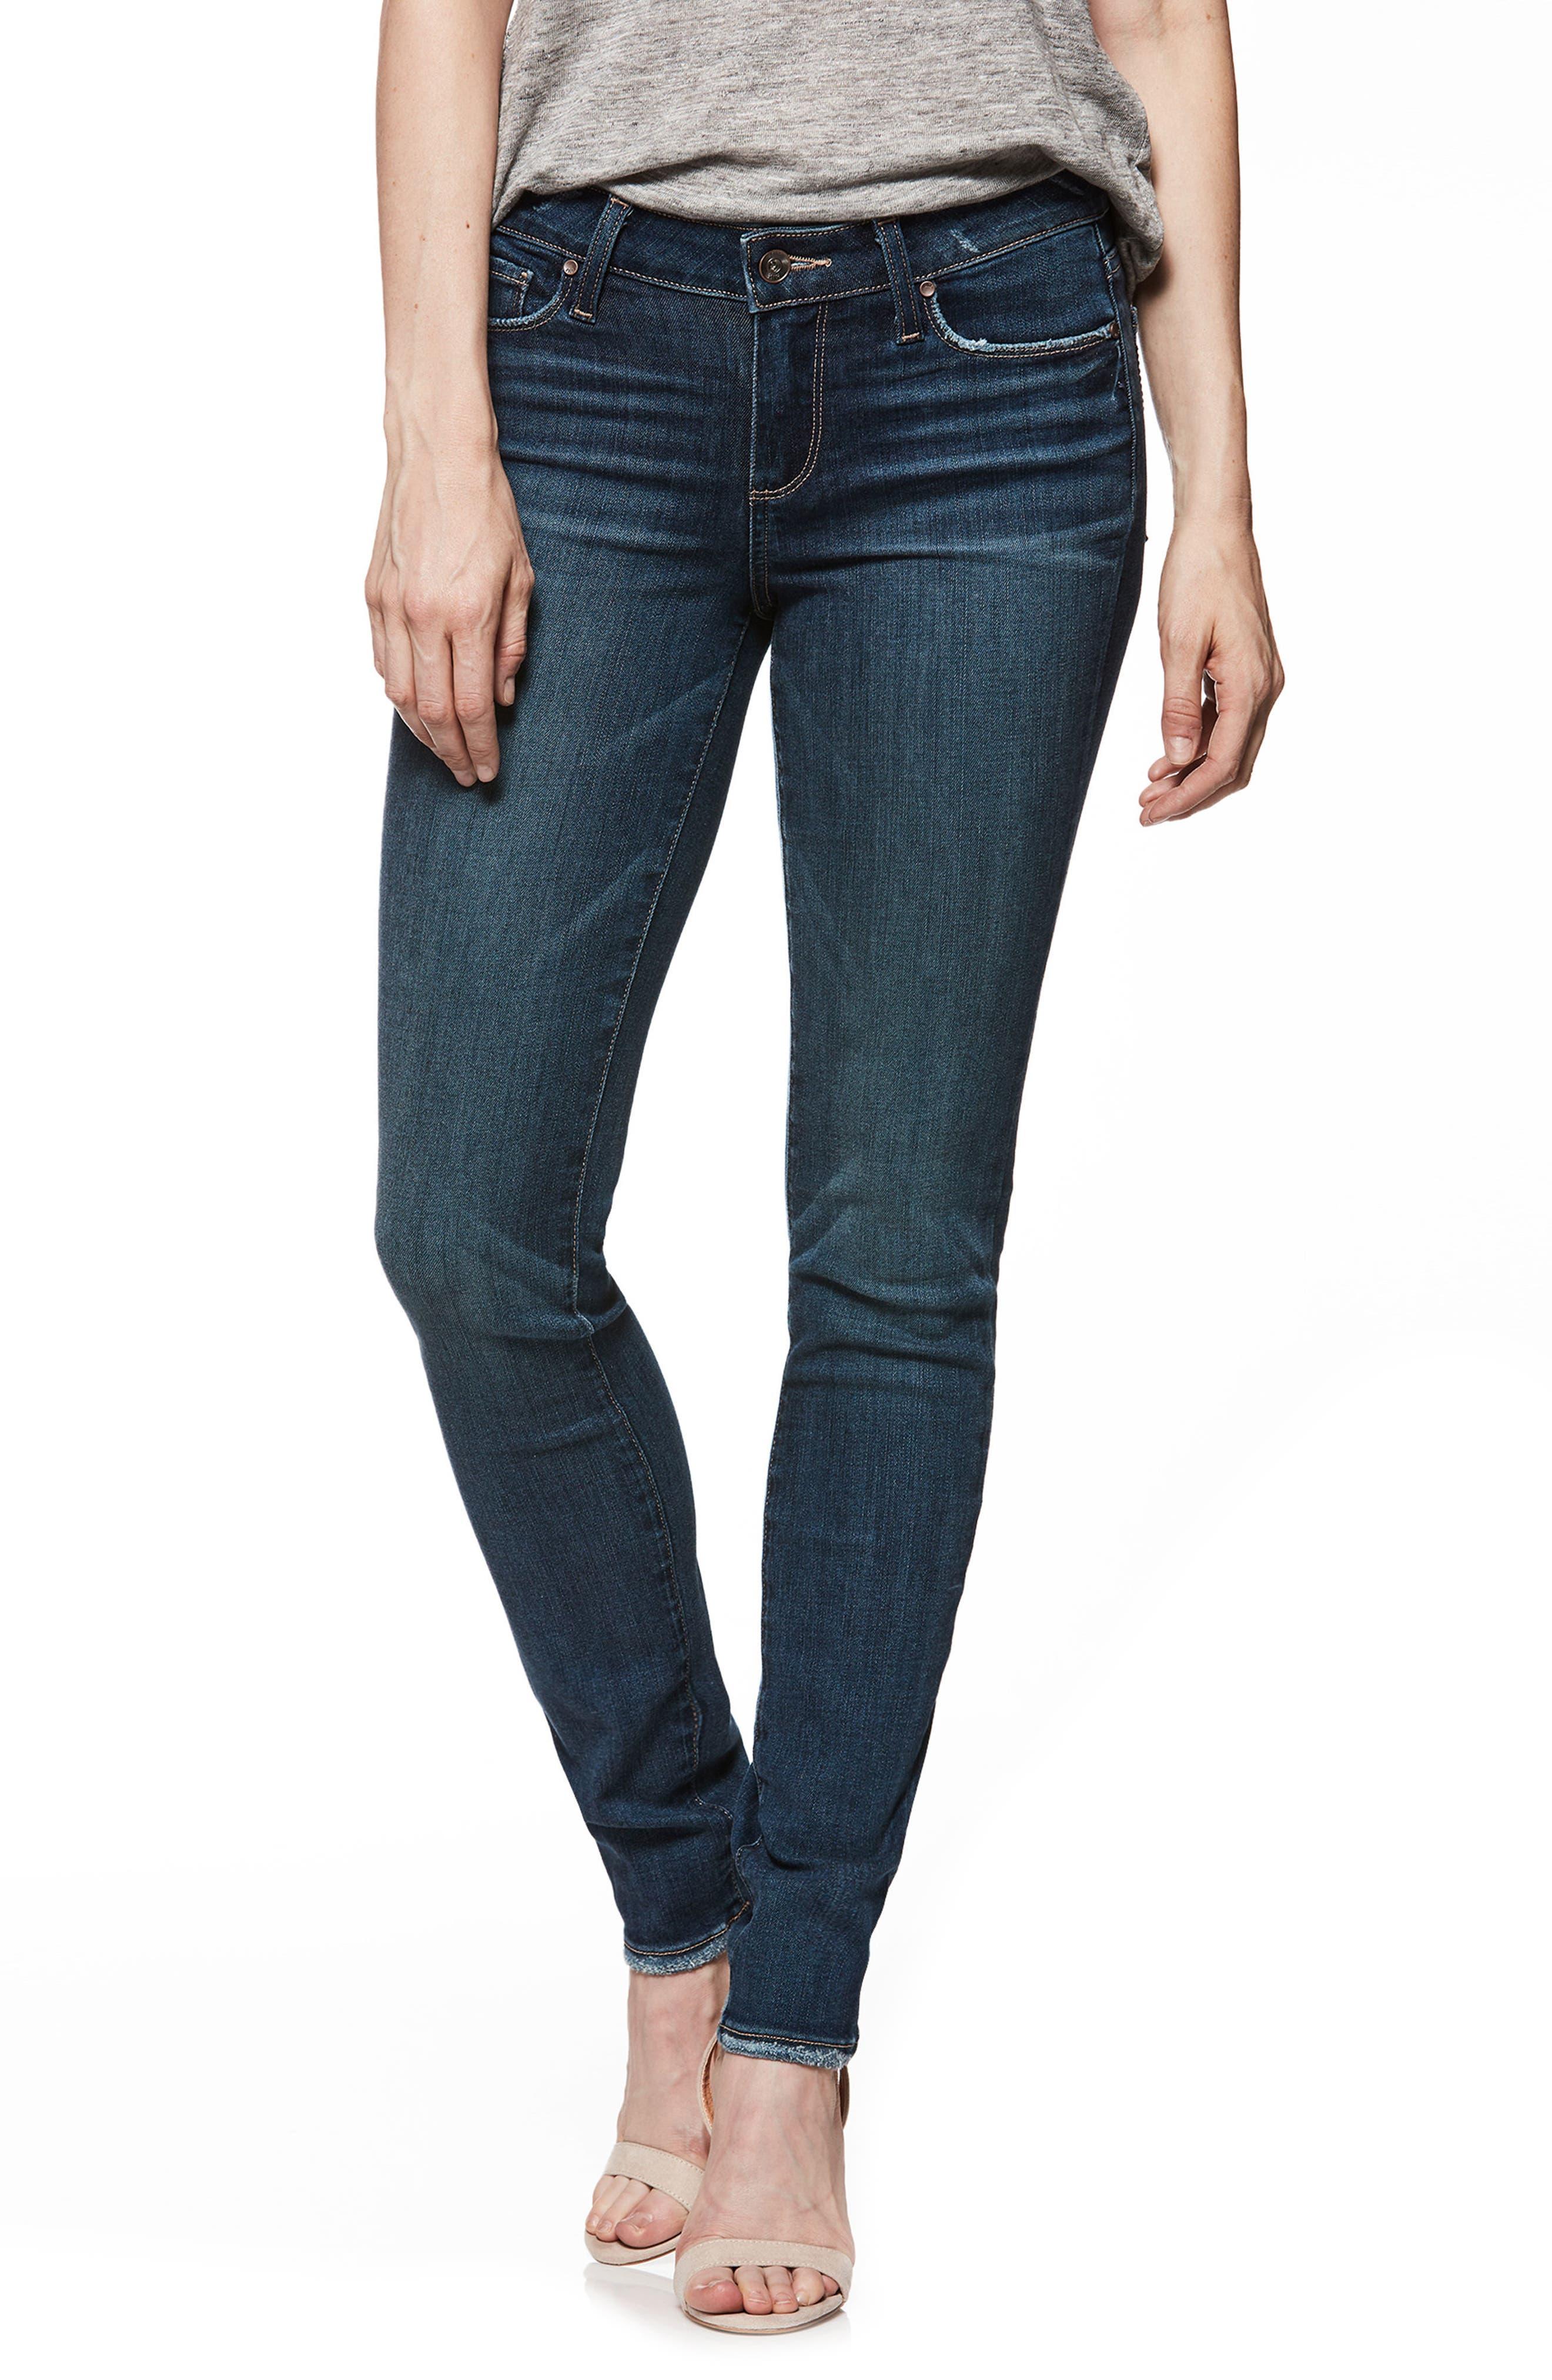 Transcend Vintage - Verdugo Ultra Skinny Jeans,                             Main thumbnail 1, color,                             Emilio